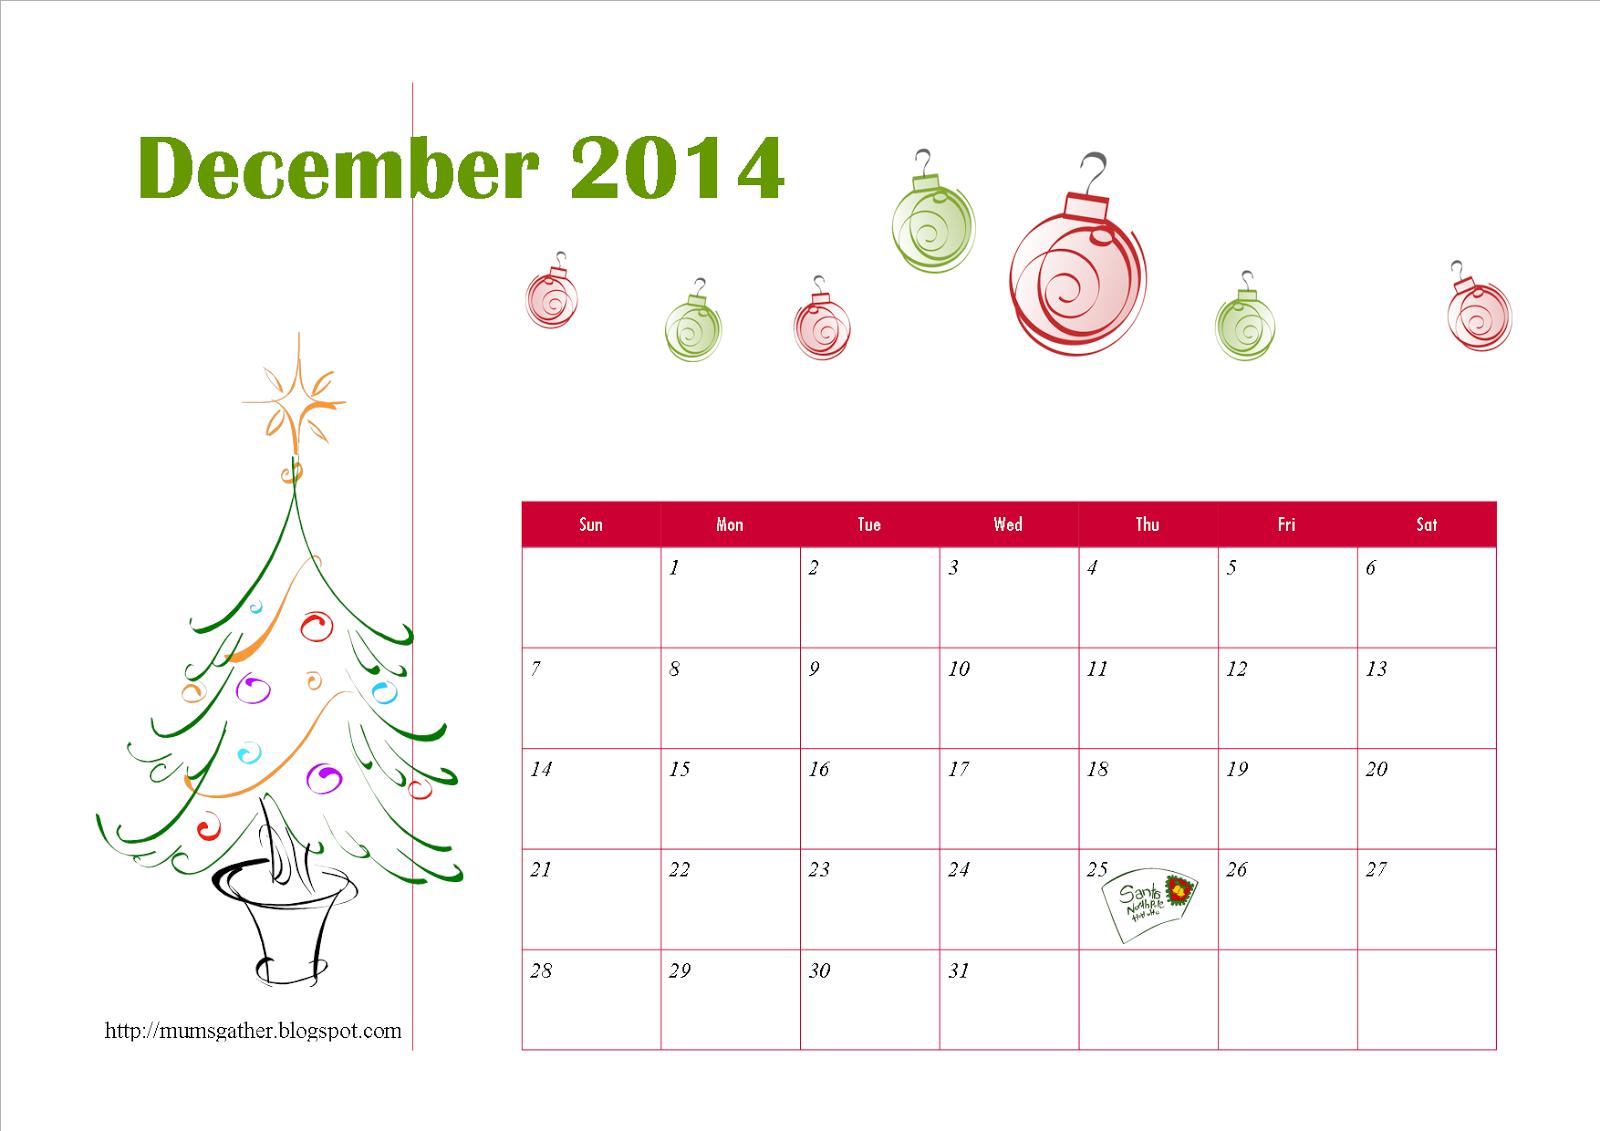 Free Printable December 2014 Calendar For Kids - Santa, Christmas Tree ...